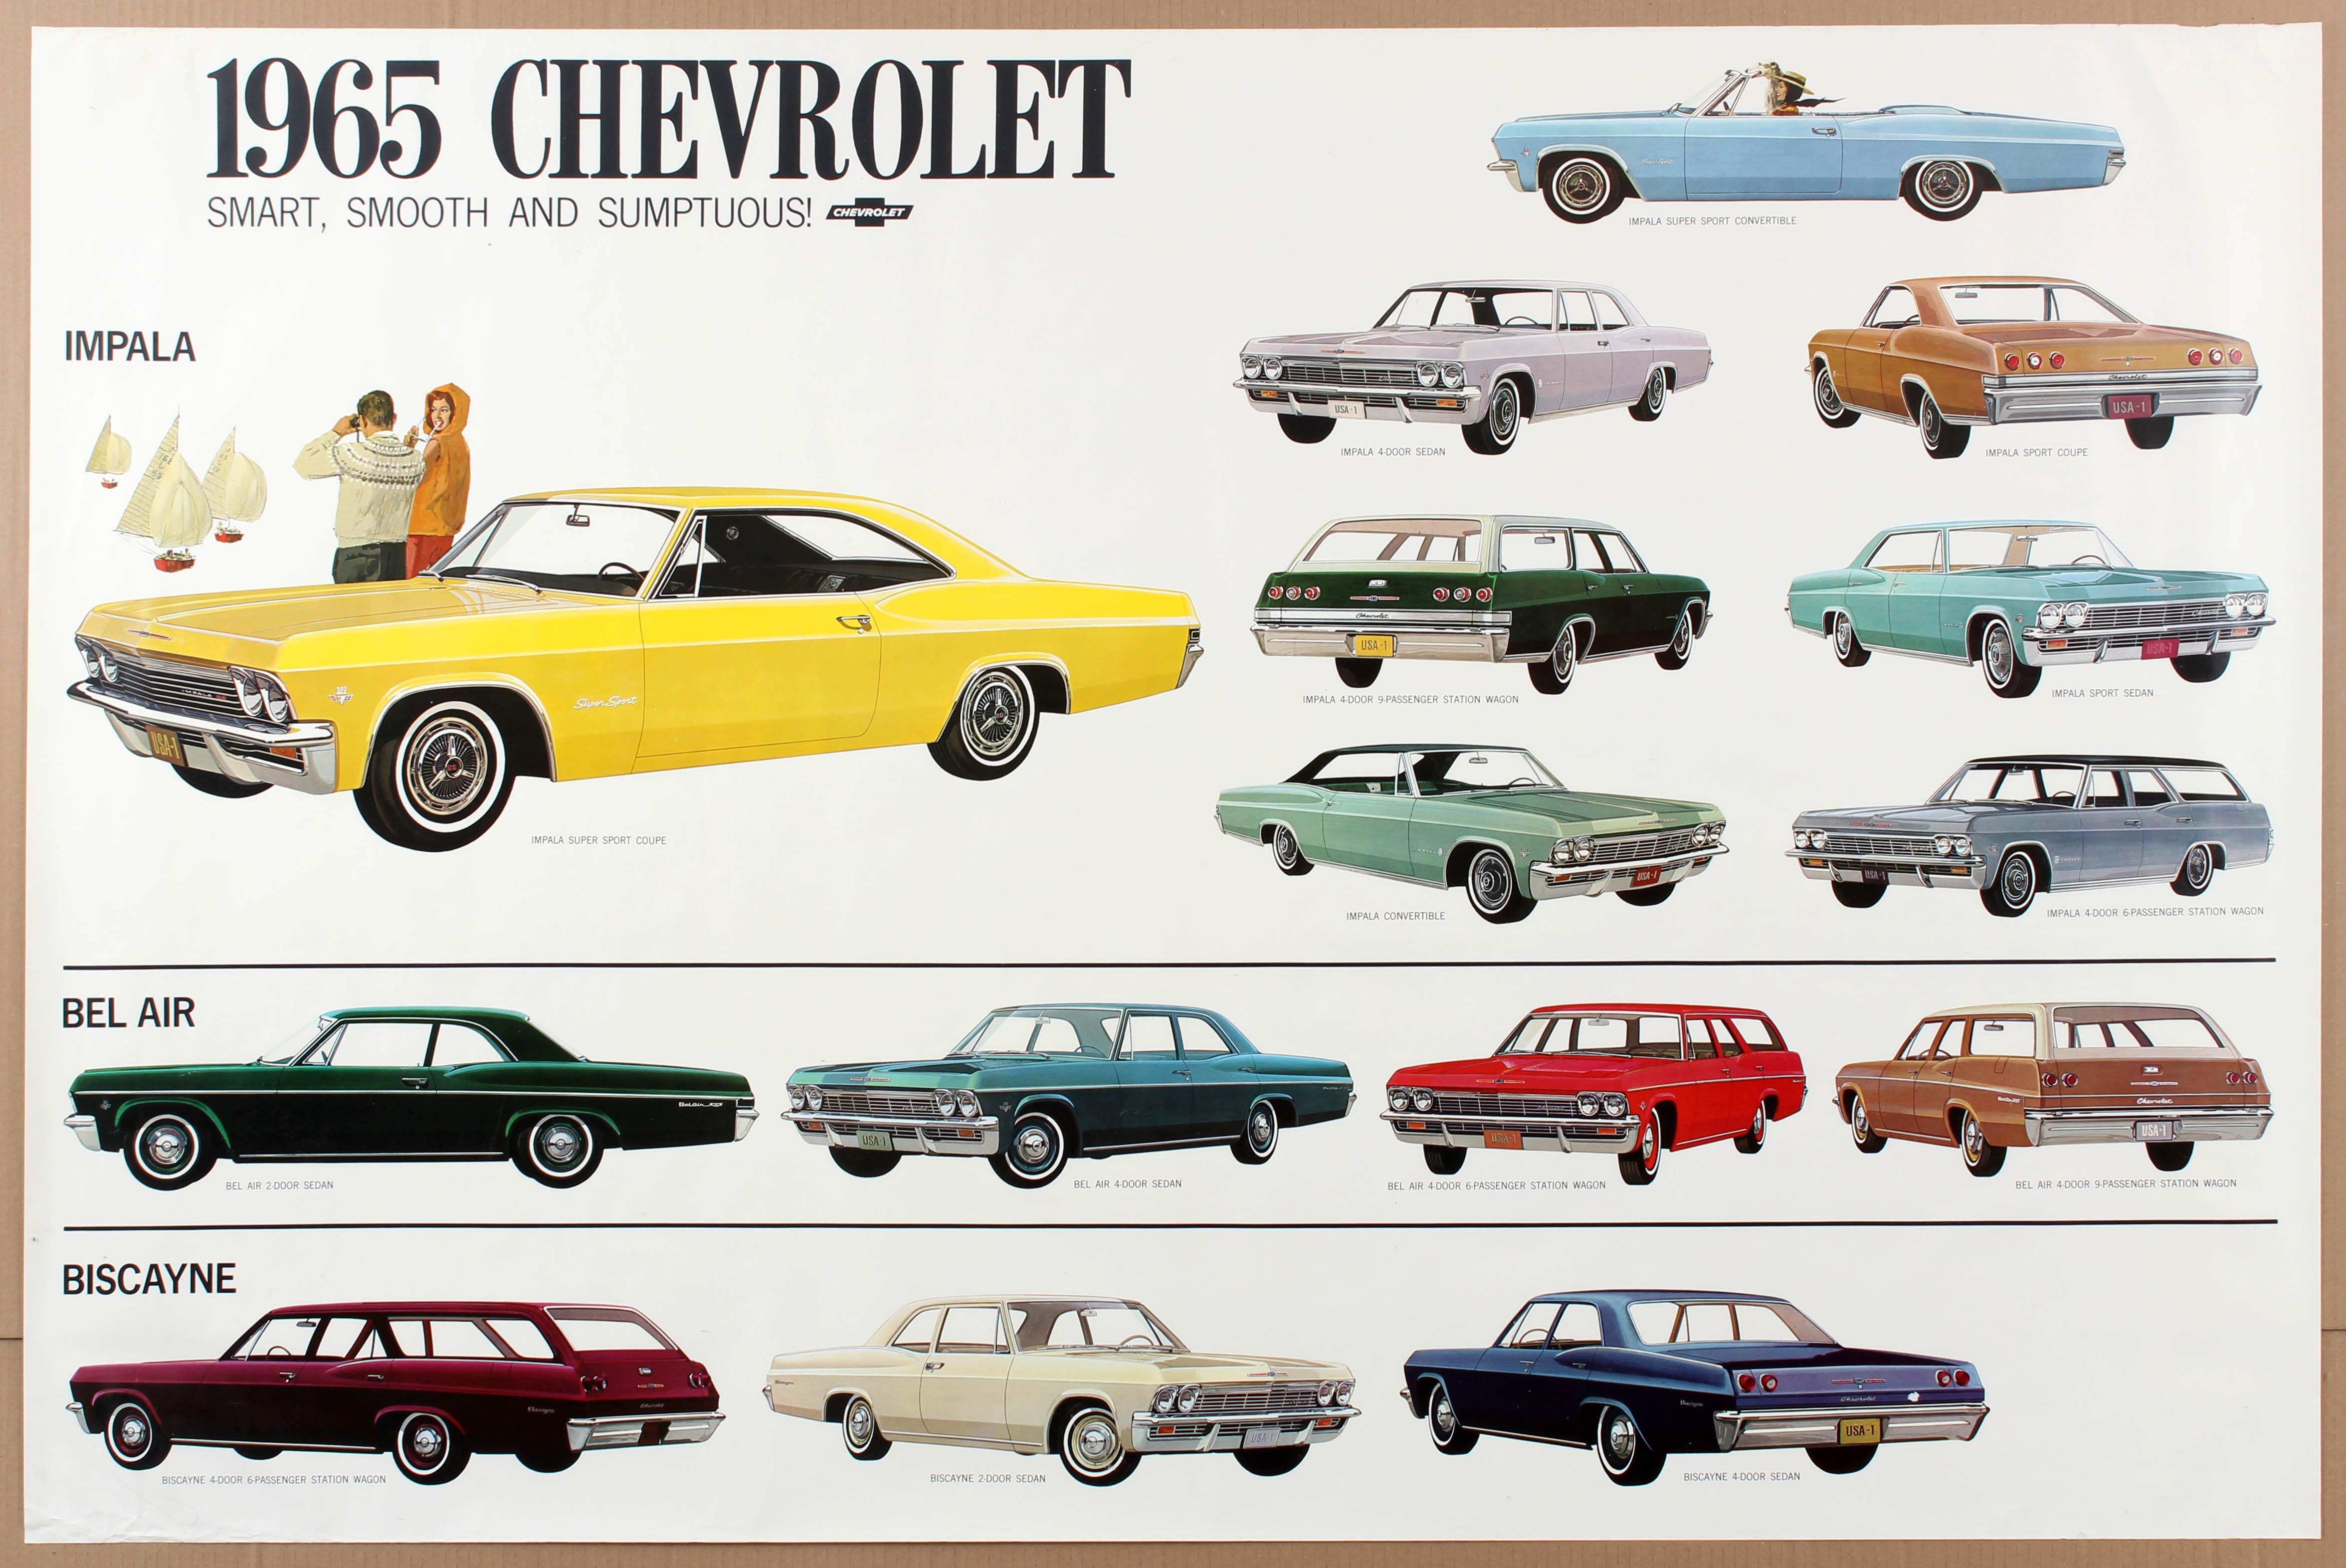 Advertising Poster 1965 Chevrolet Car Impala Bel Air